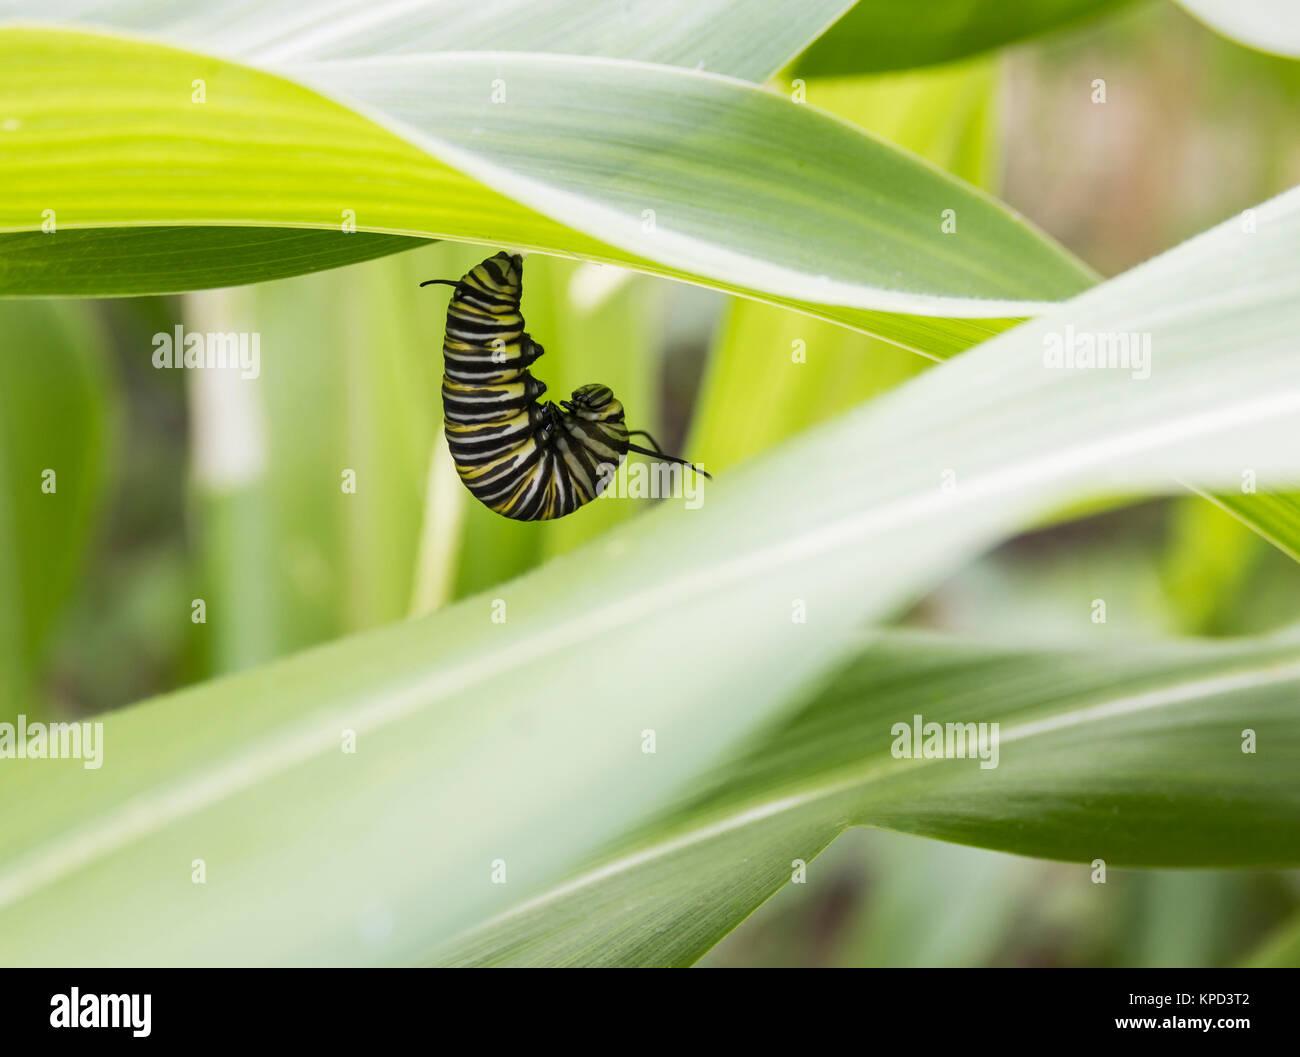 Monarch Butterfly (Danaus plexippus) larva in pupation on underside of leaf in allotment in Spain - Stock Image